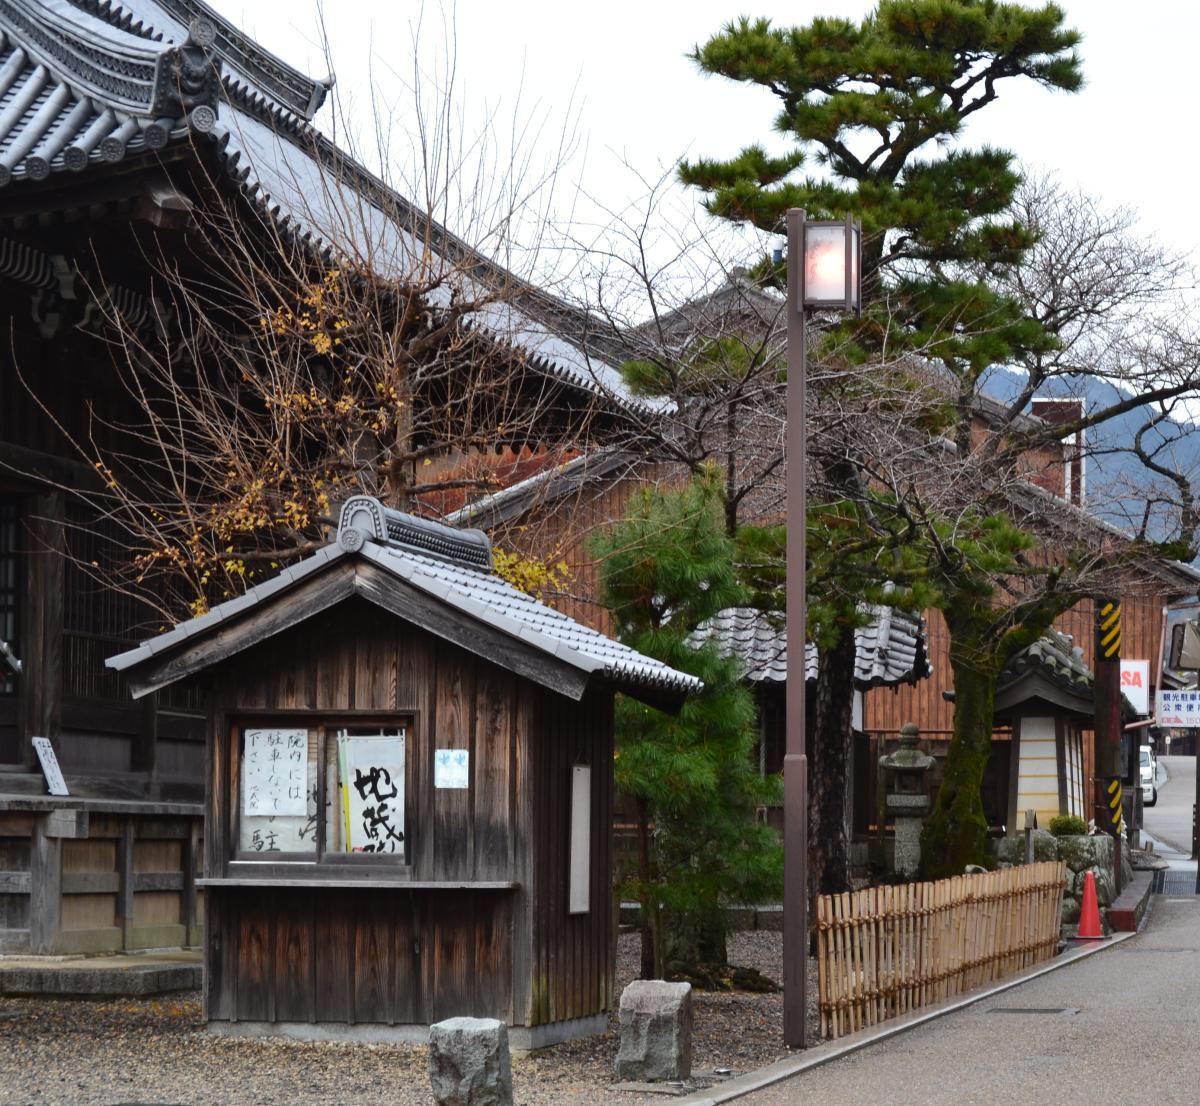 Kameyama-shi Japan  city images : Seki juku: Kota Tua di Kameyama shi, Jepang | bagustris@wordpress